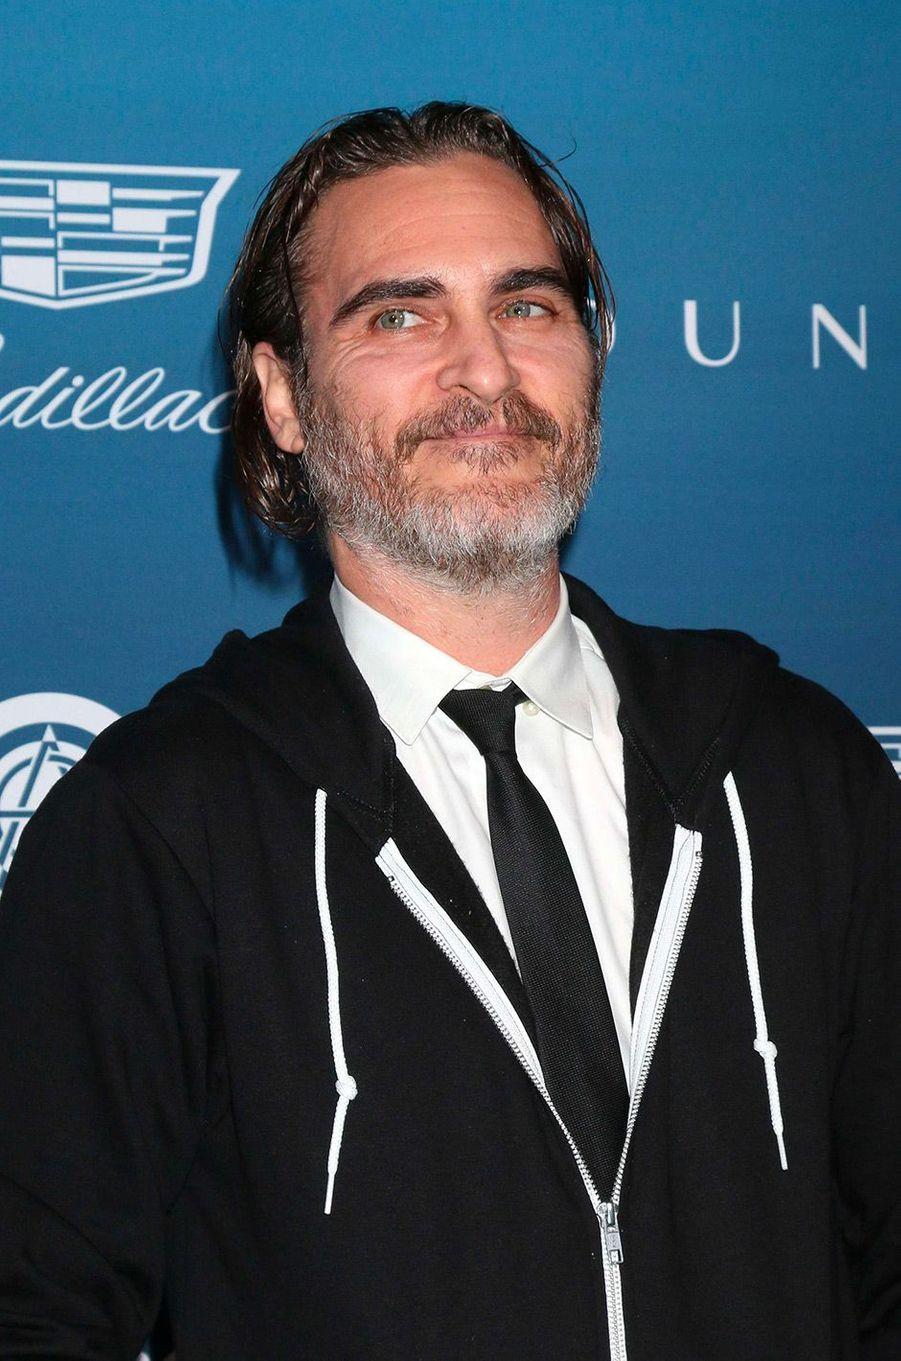 Joaquin Phoenix au gala Art of Elysium, à Los Angeles, samedi 5 janvier